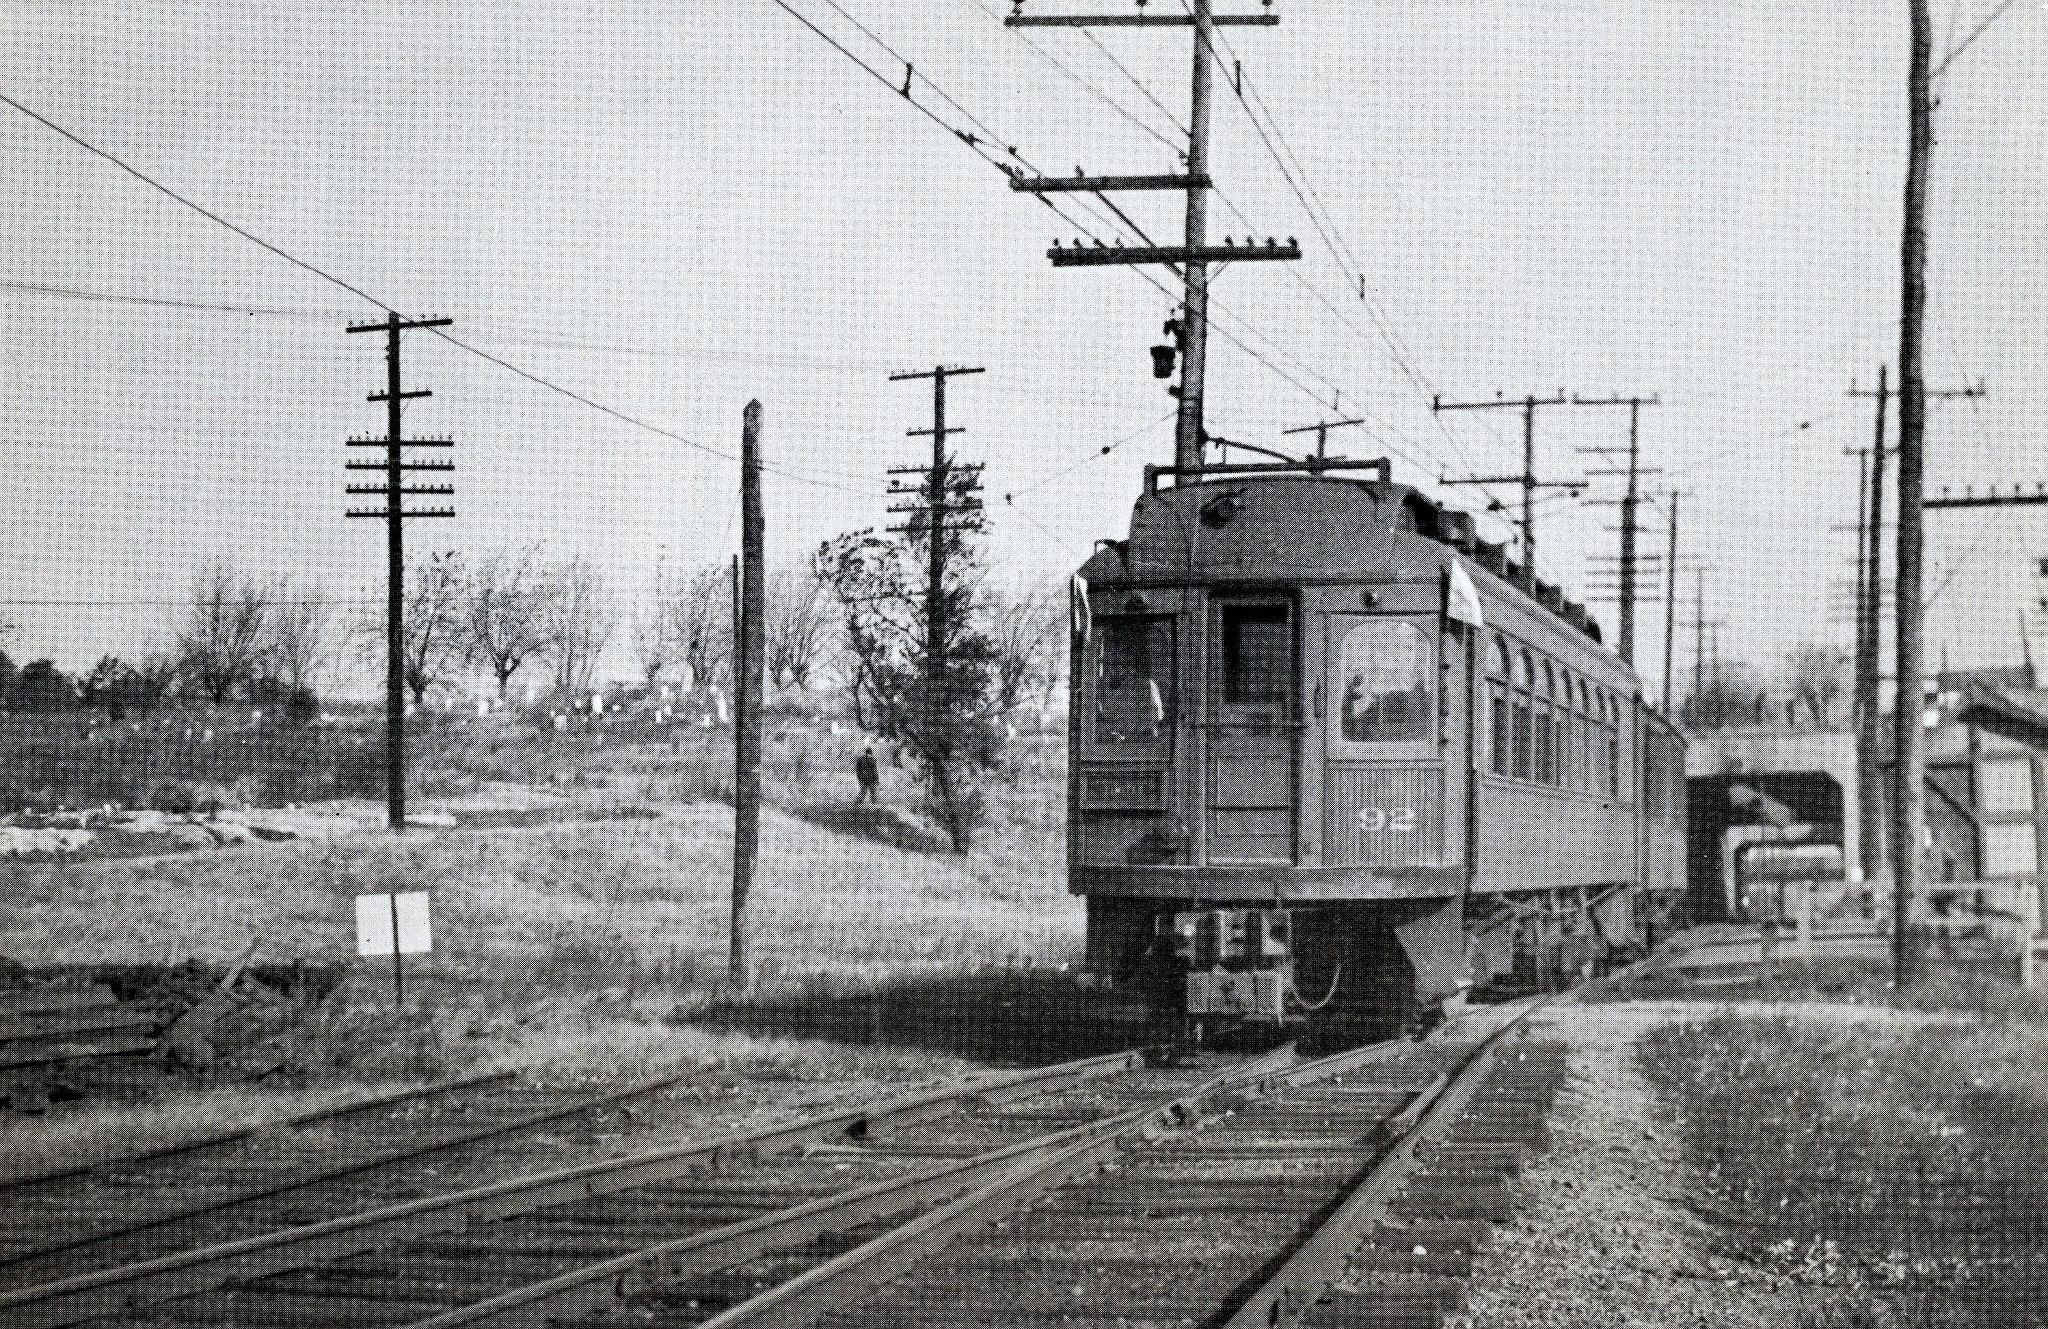 Baltimore & Annapolis Railroad Car #92 at Westport Station. Date: November 1941. Source: R.S. Crockett Collection.